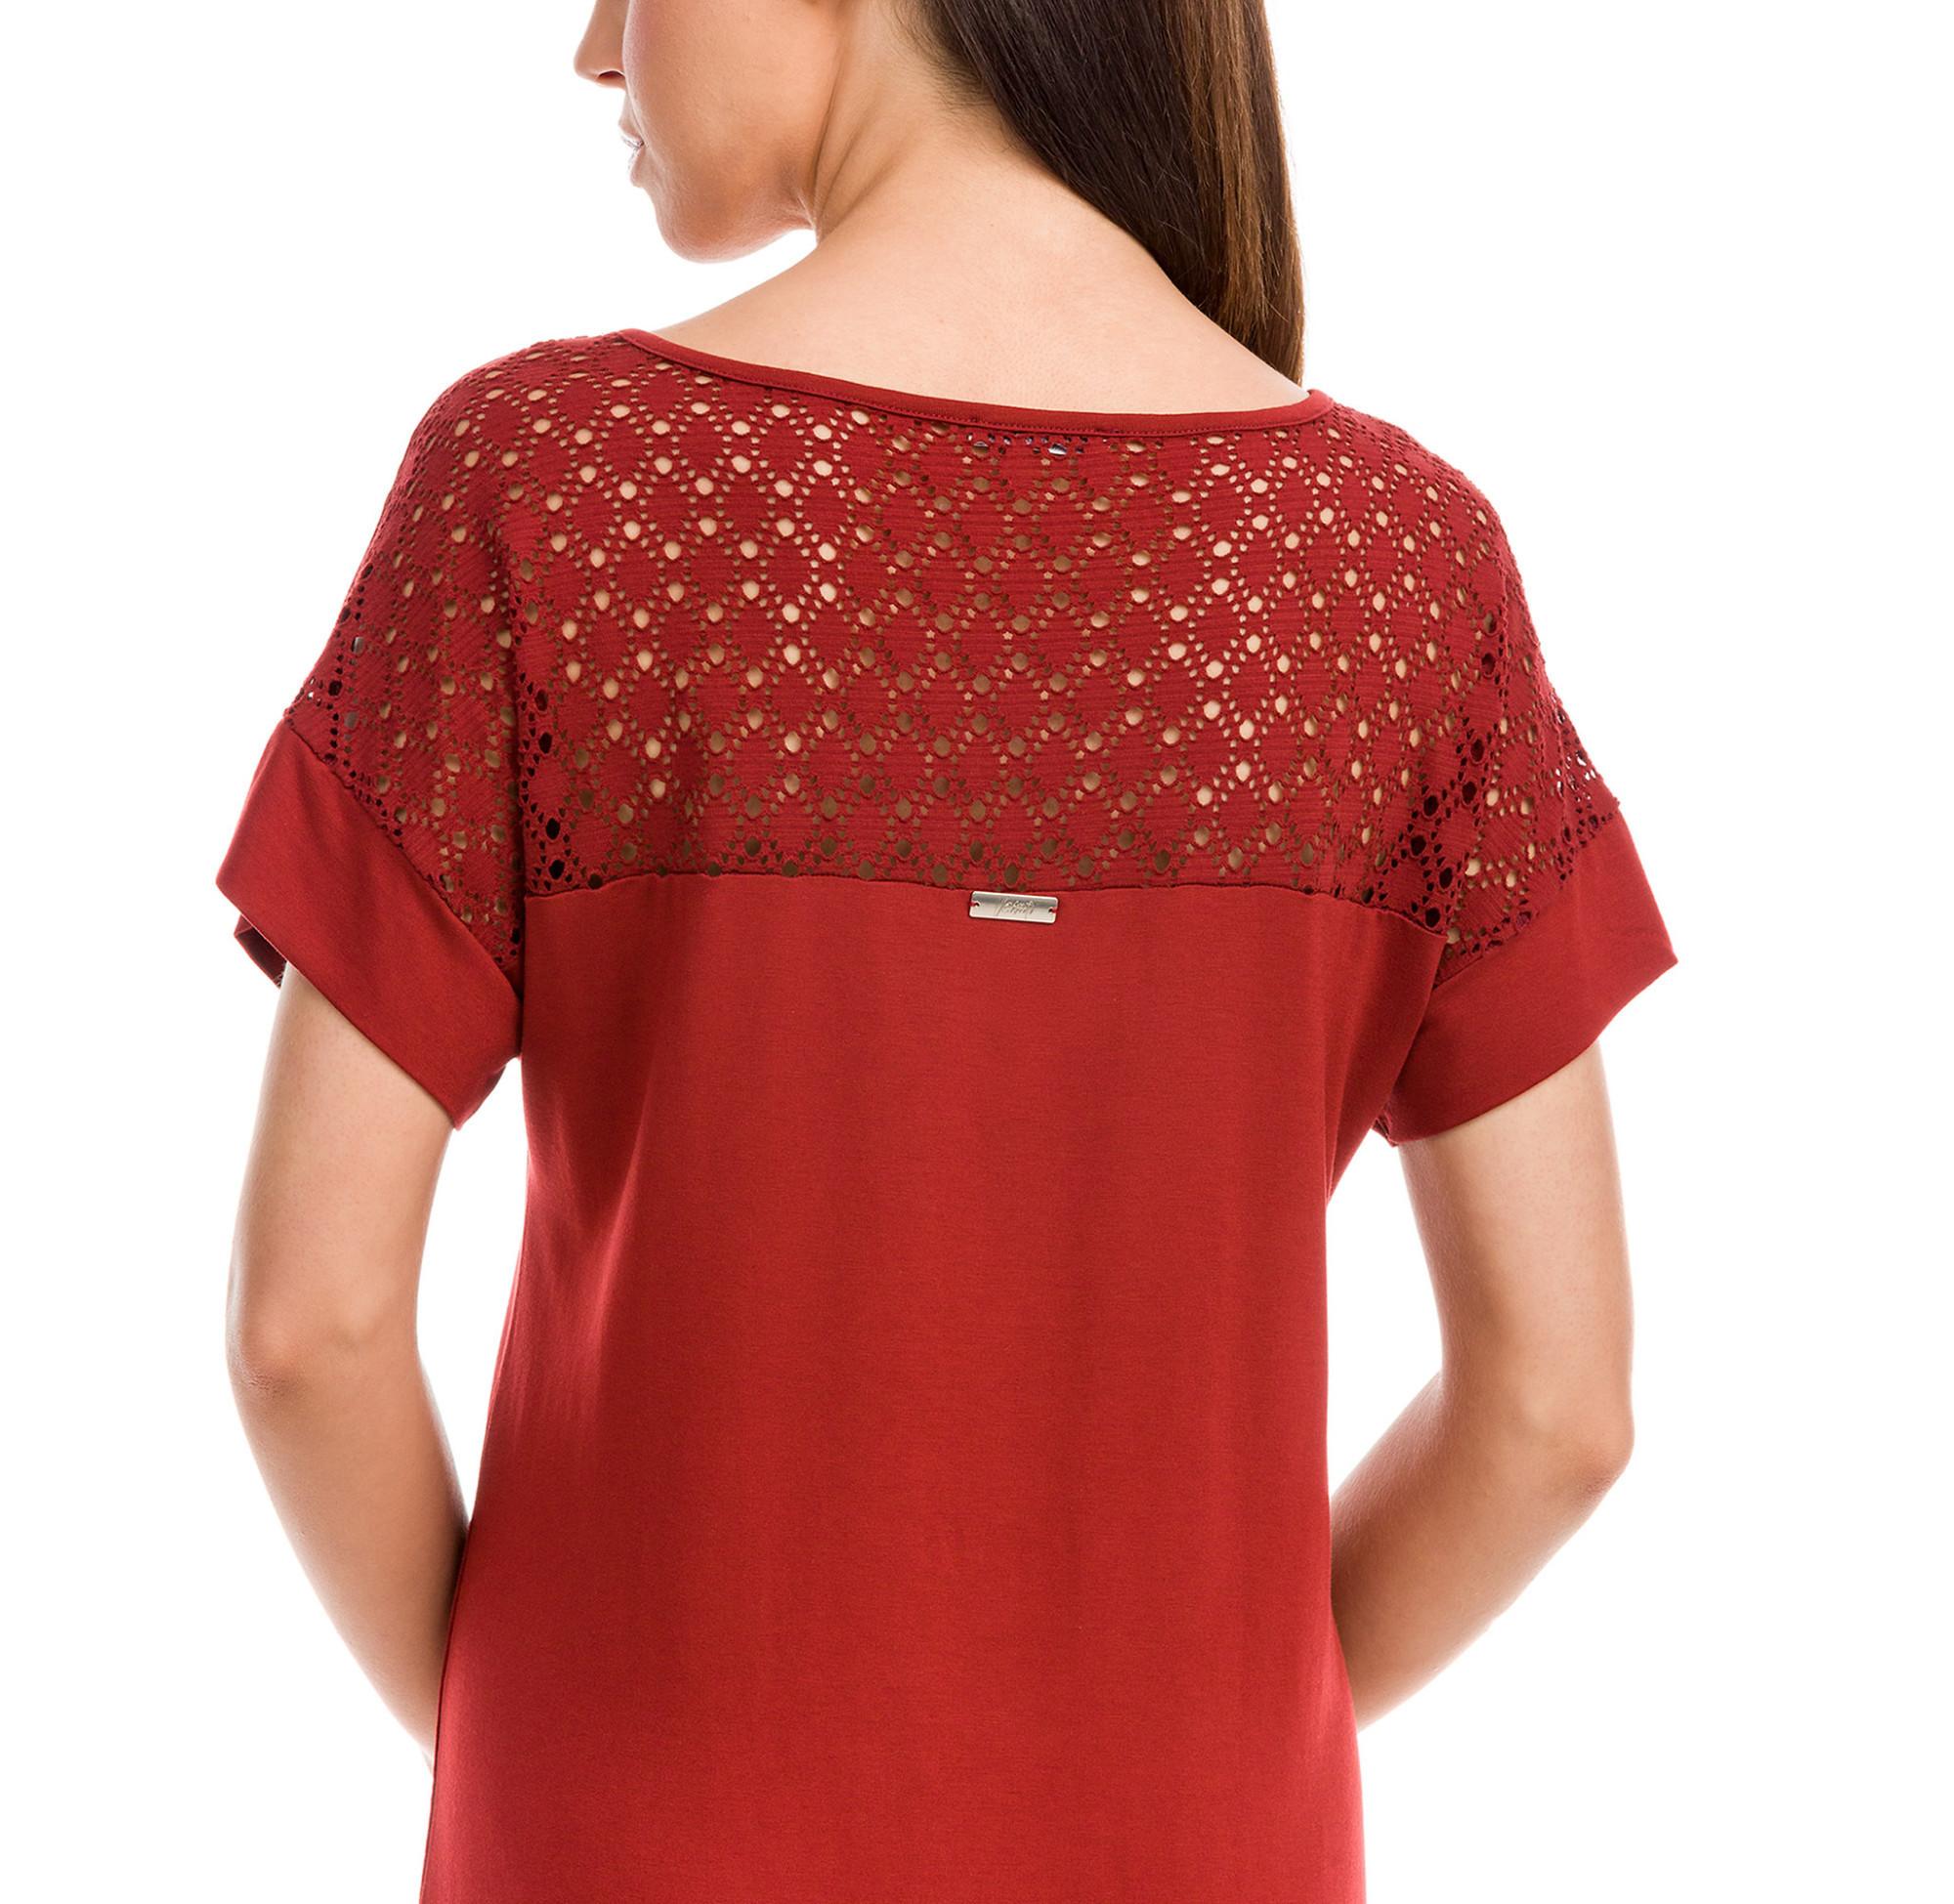 Vamp - Dámske šaty 12572 - Vamp red terracota m